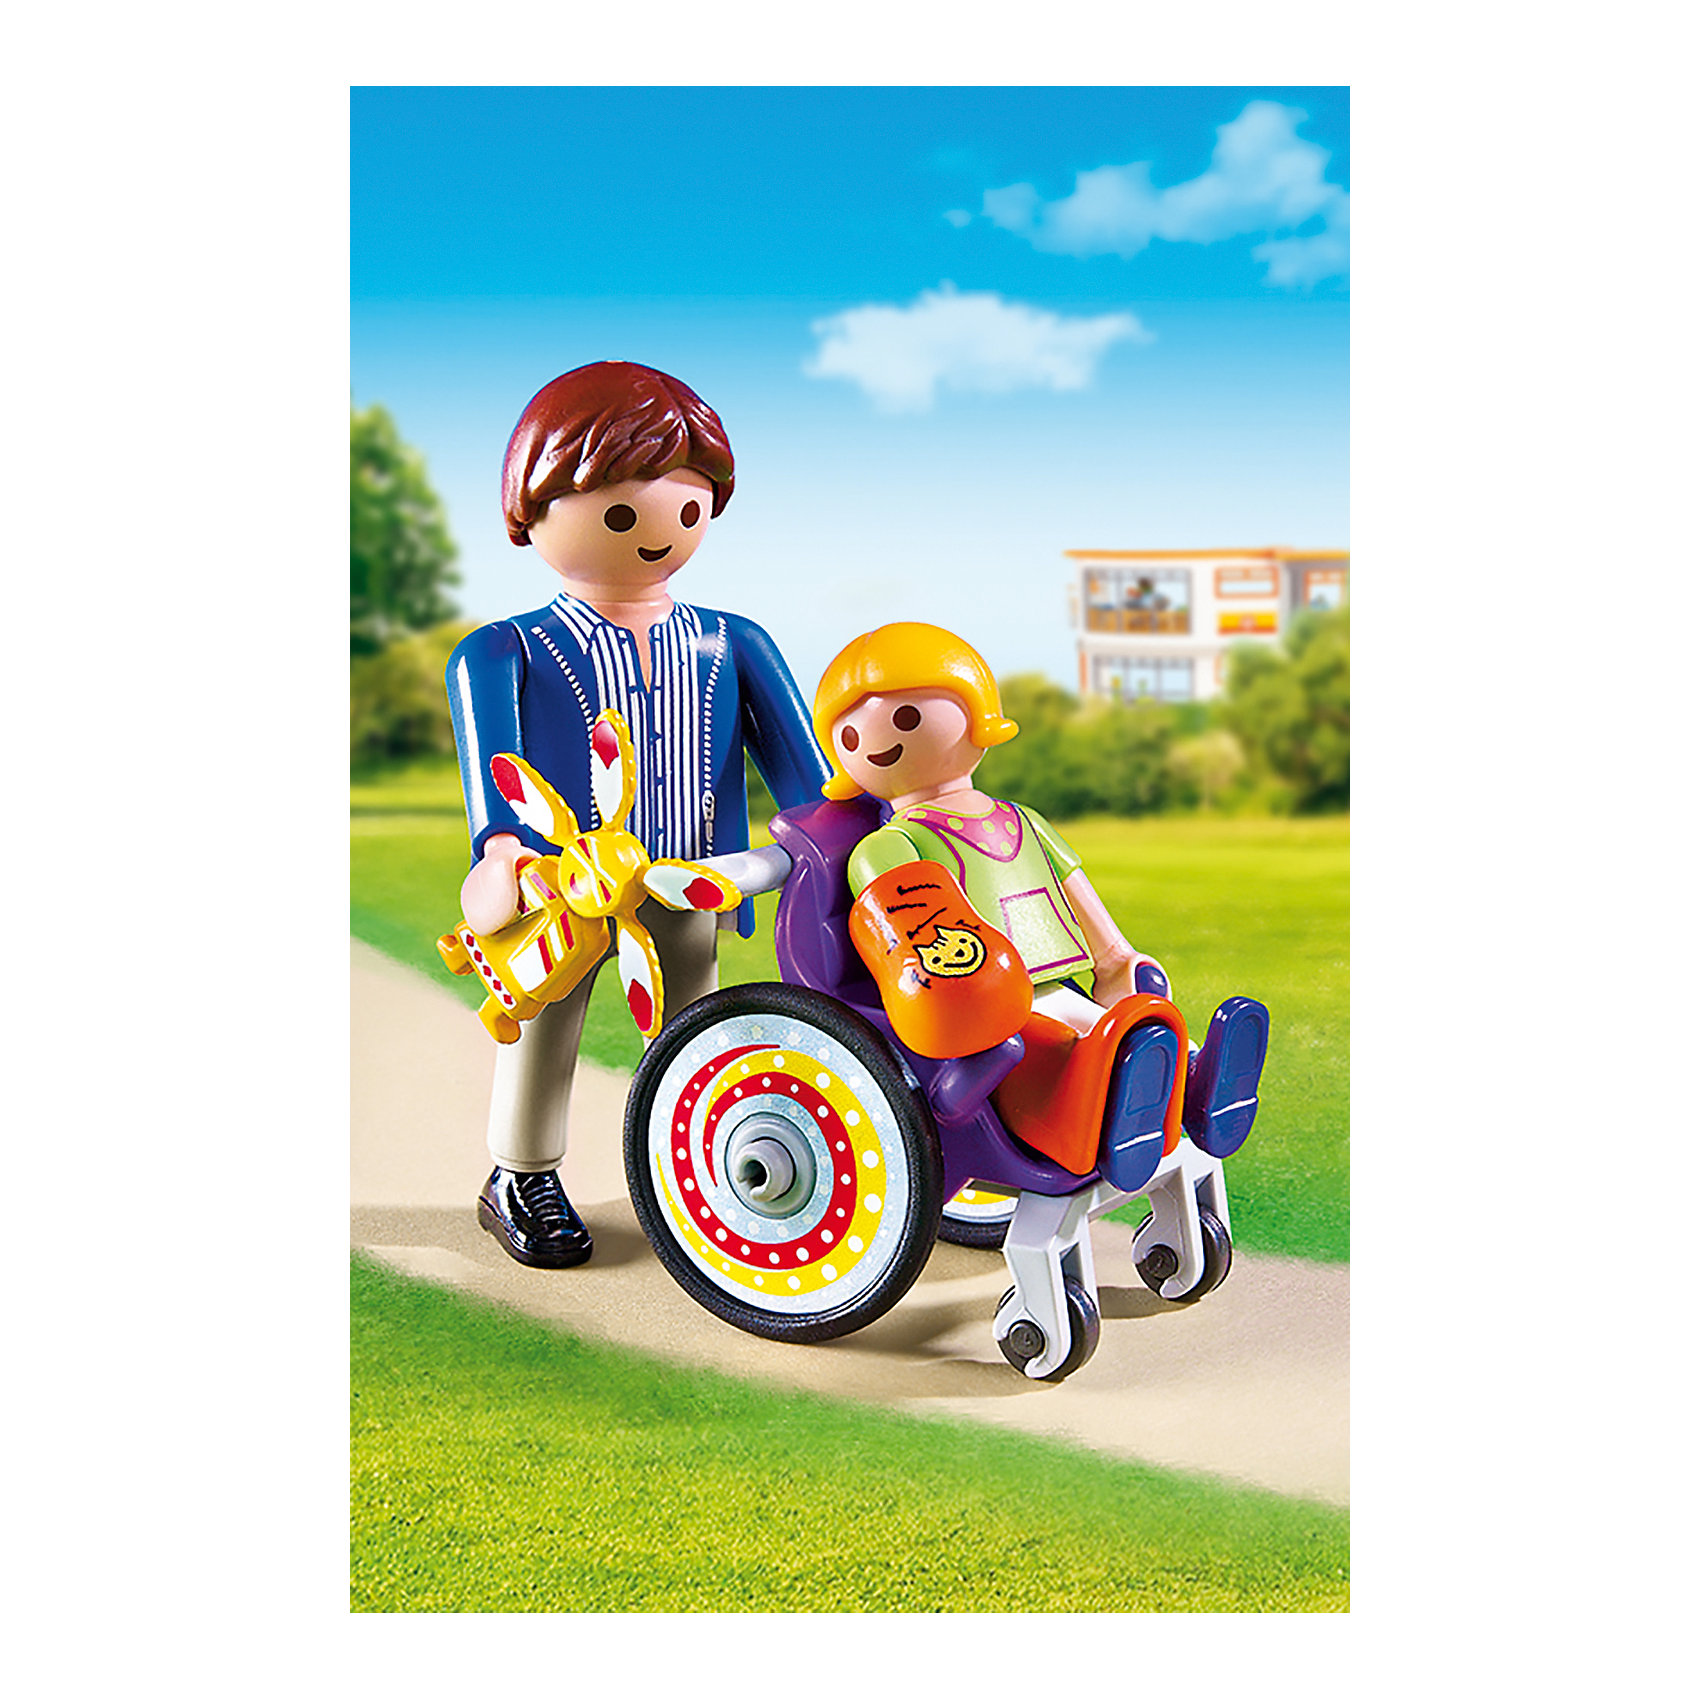 PLAYMOBIL® Детская клиника: Ребенок в коляске, PLAYMOBIL playmobil® детская клиника рентгеновский кабинет playmobil